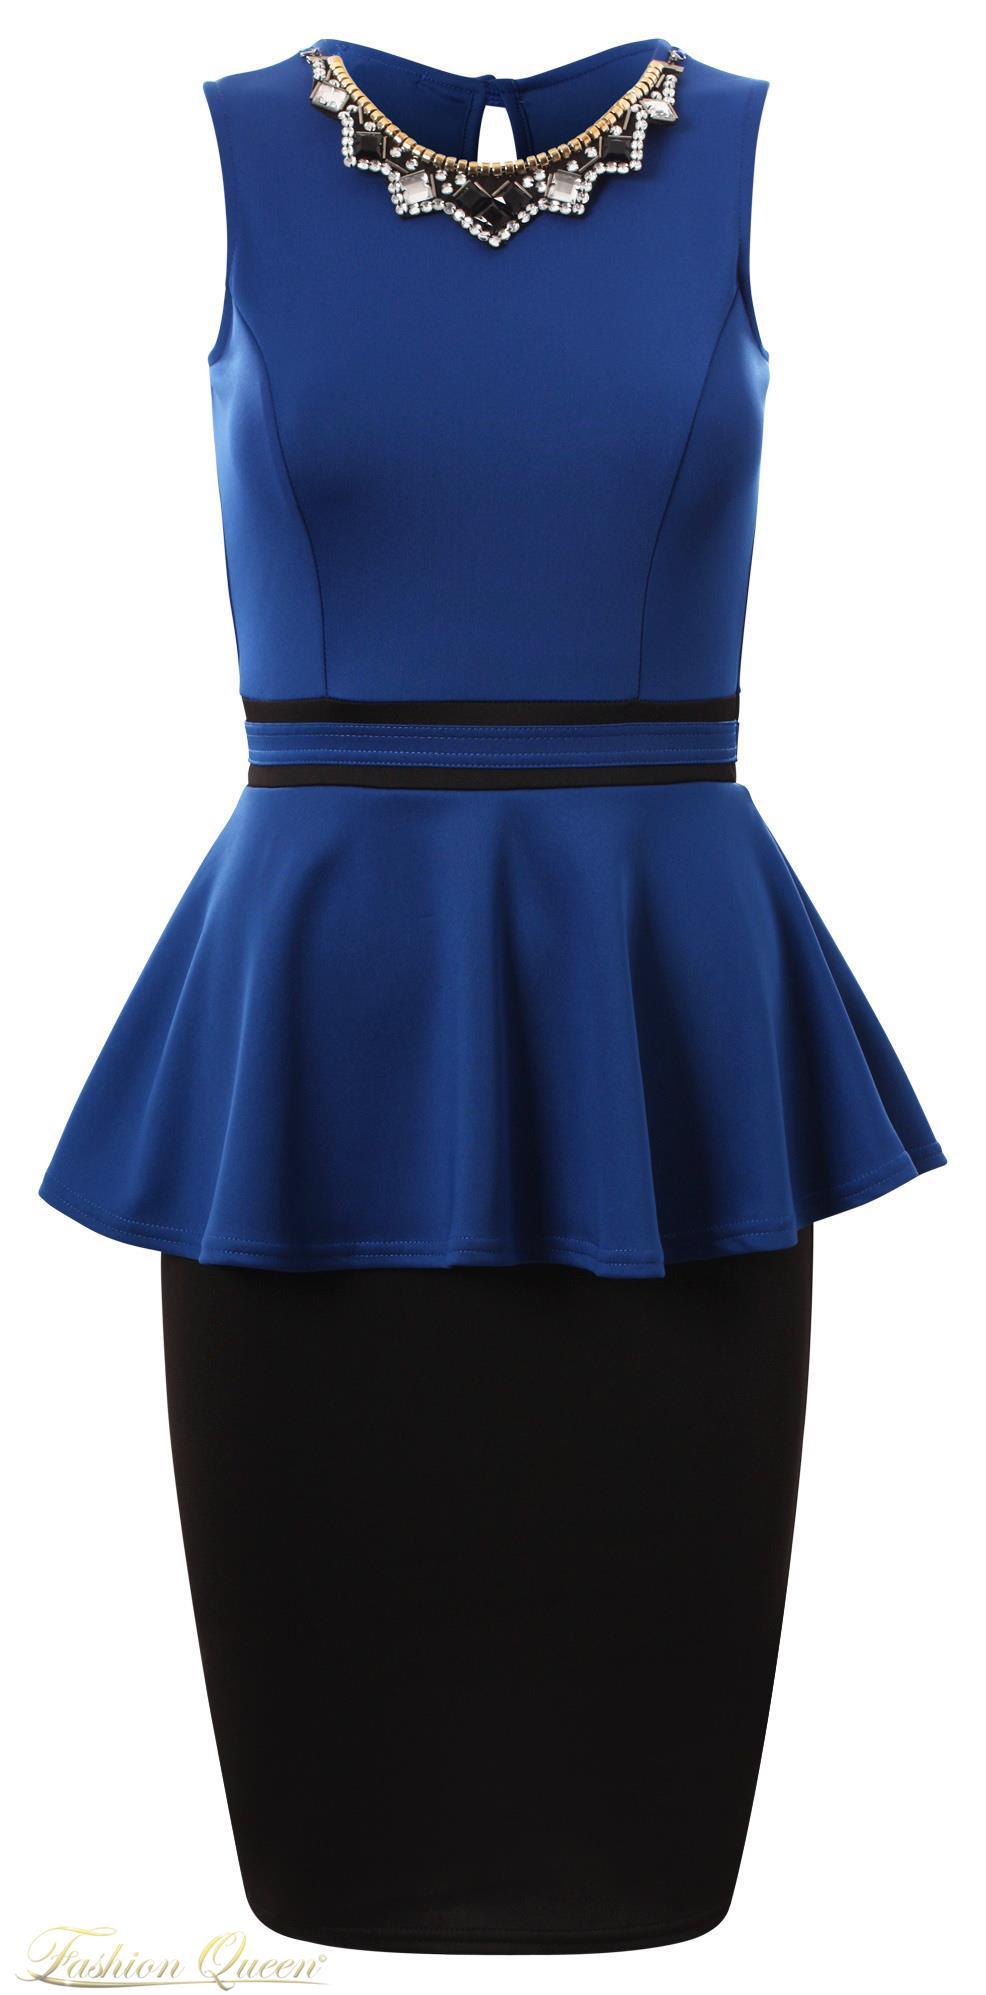 d17f0f25b9e2 Fashion Queen - Dámske oblečenie a móda - Čierno-modré šaty